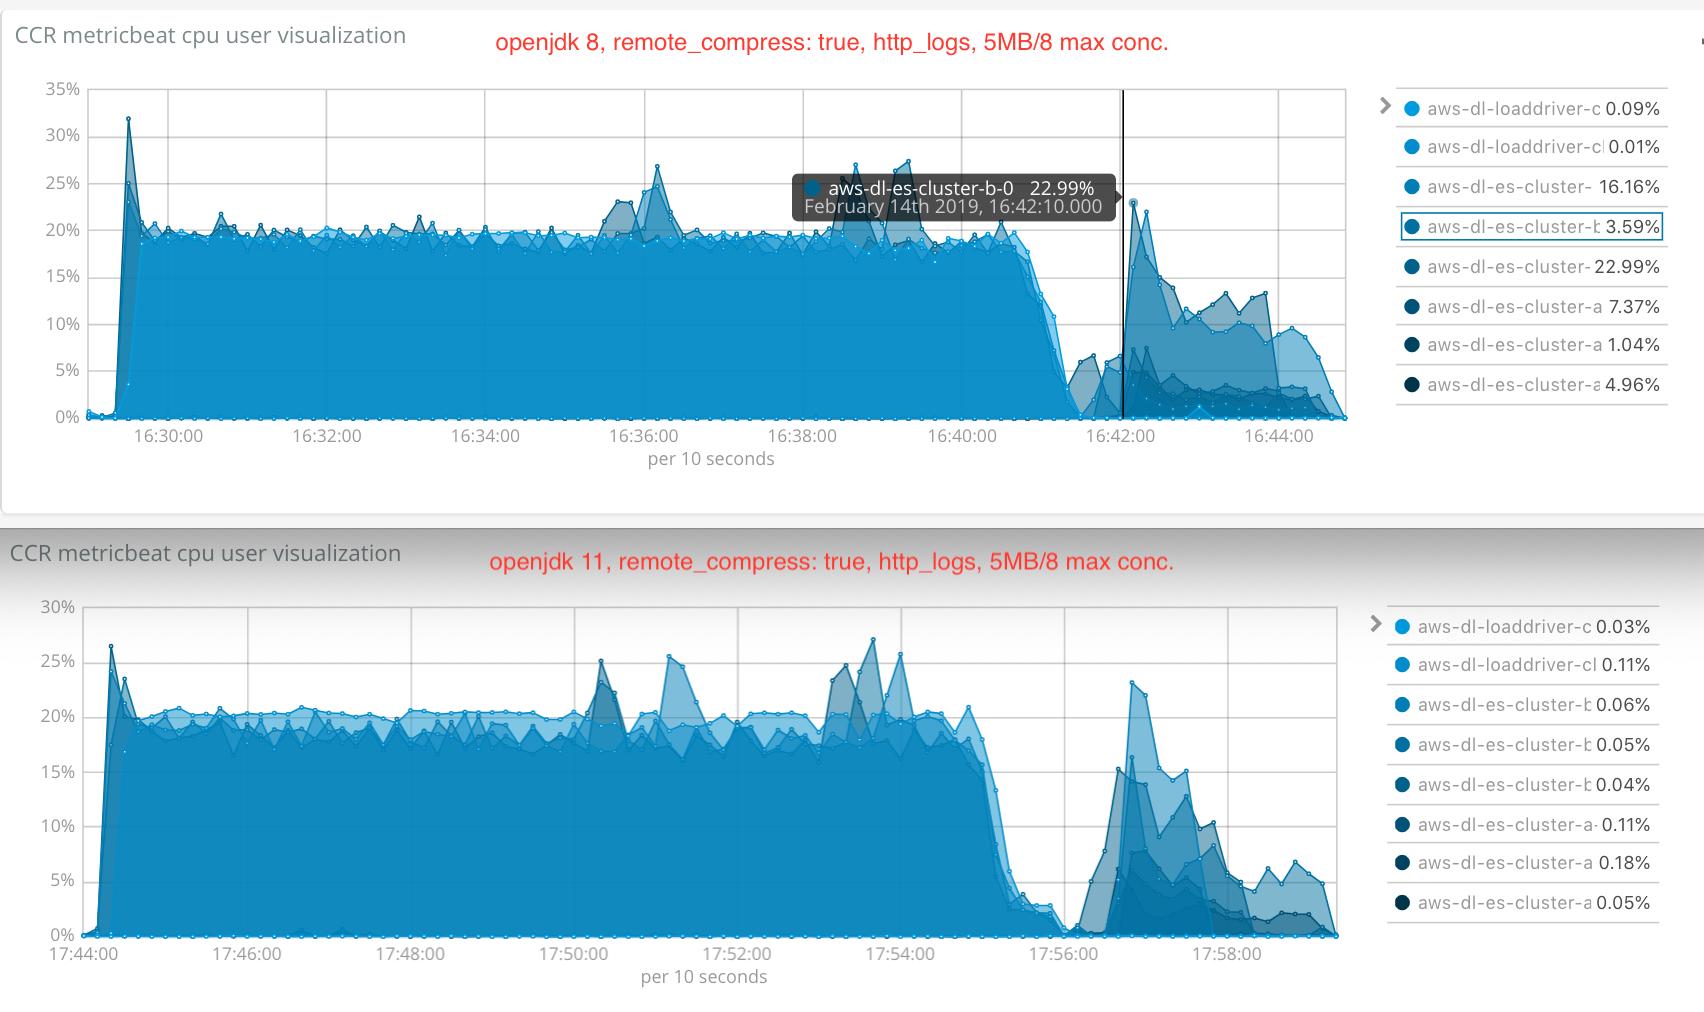 http_logs_cpu_use_compare_java11_vs_java8_remote_compress_true_5mb_8conc